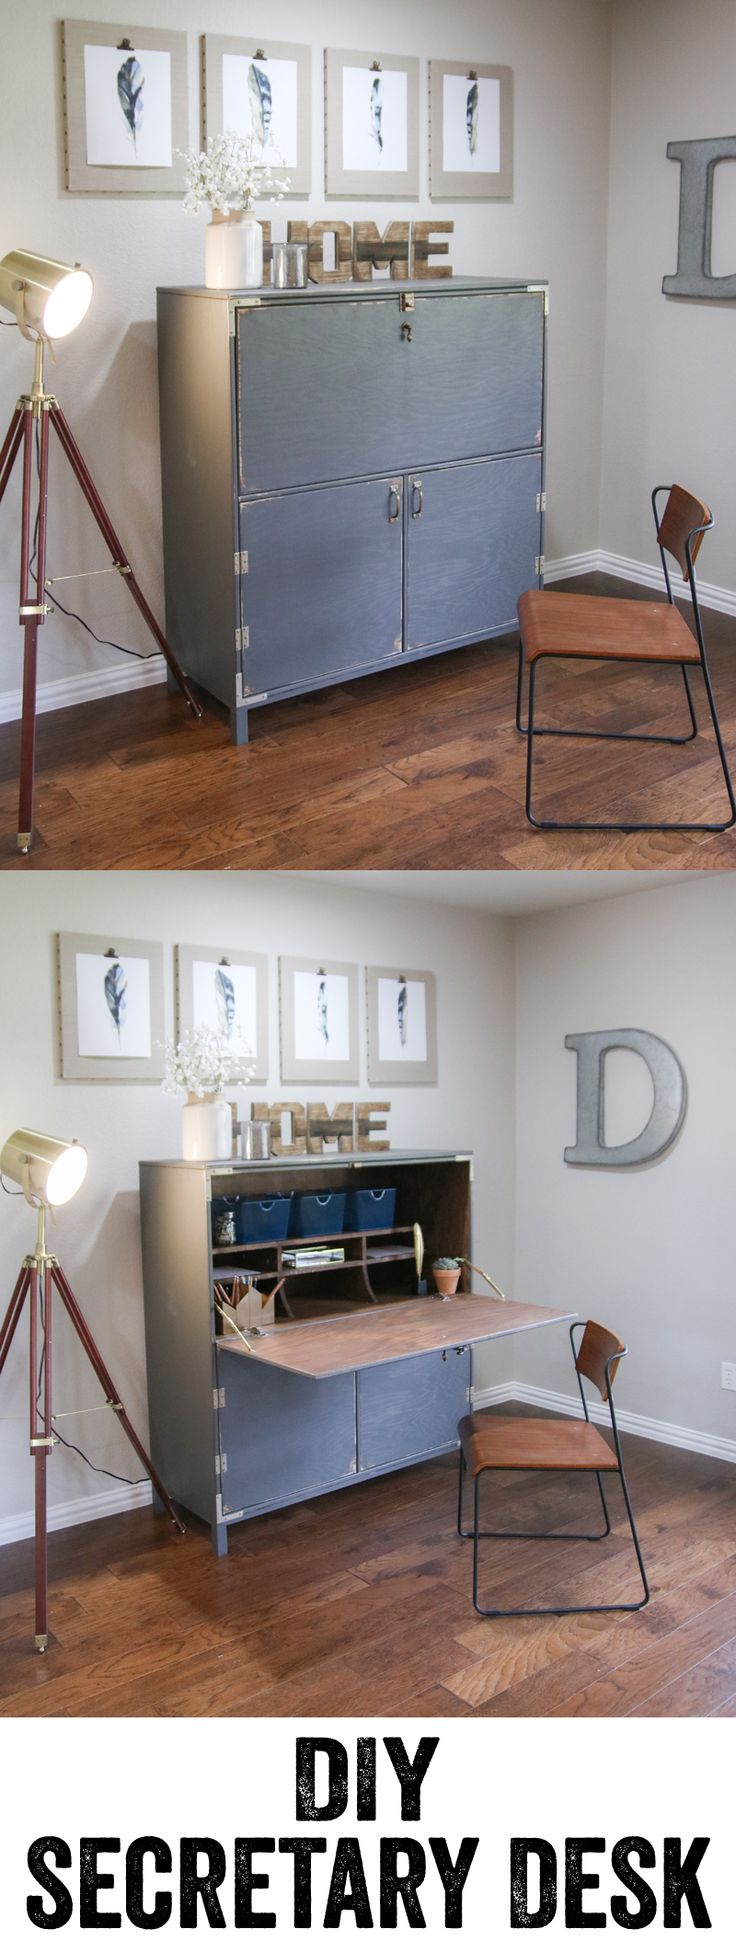 Secretary desk furniture plans - Diy Flip Top Secretary Desk As Seen On Hgtv Open Concept